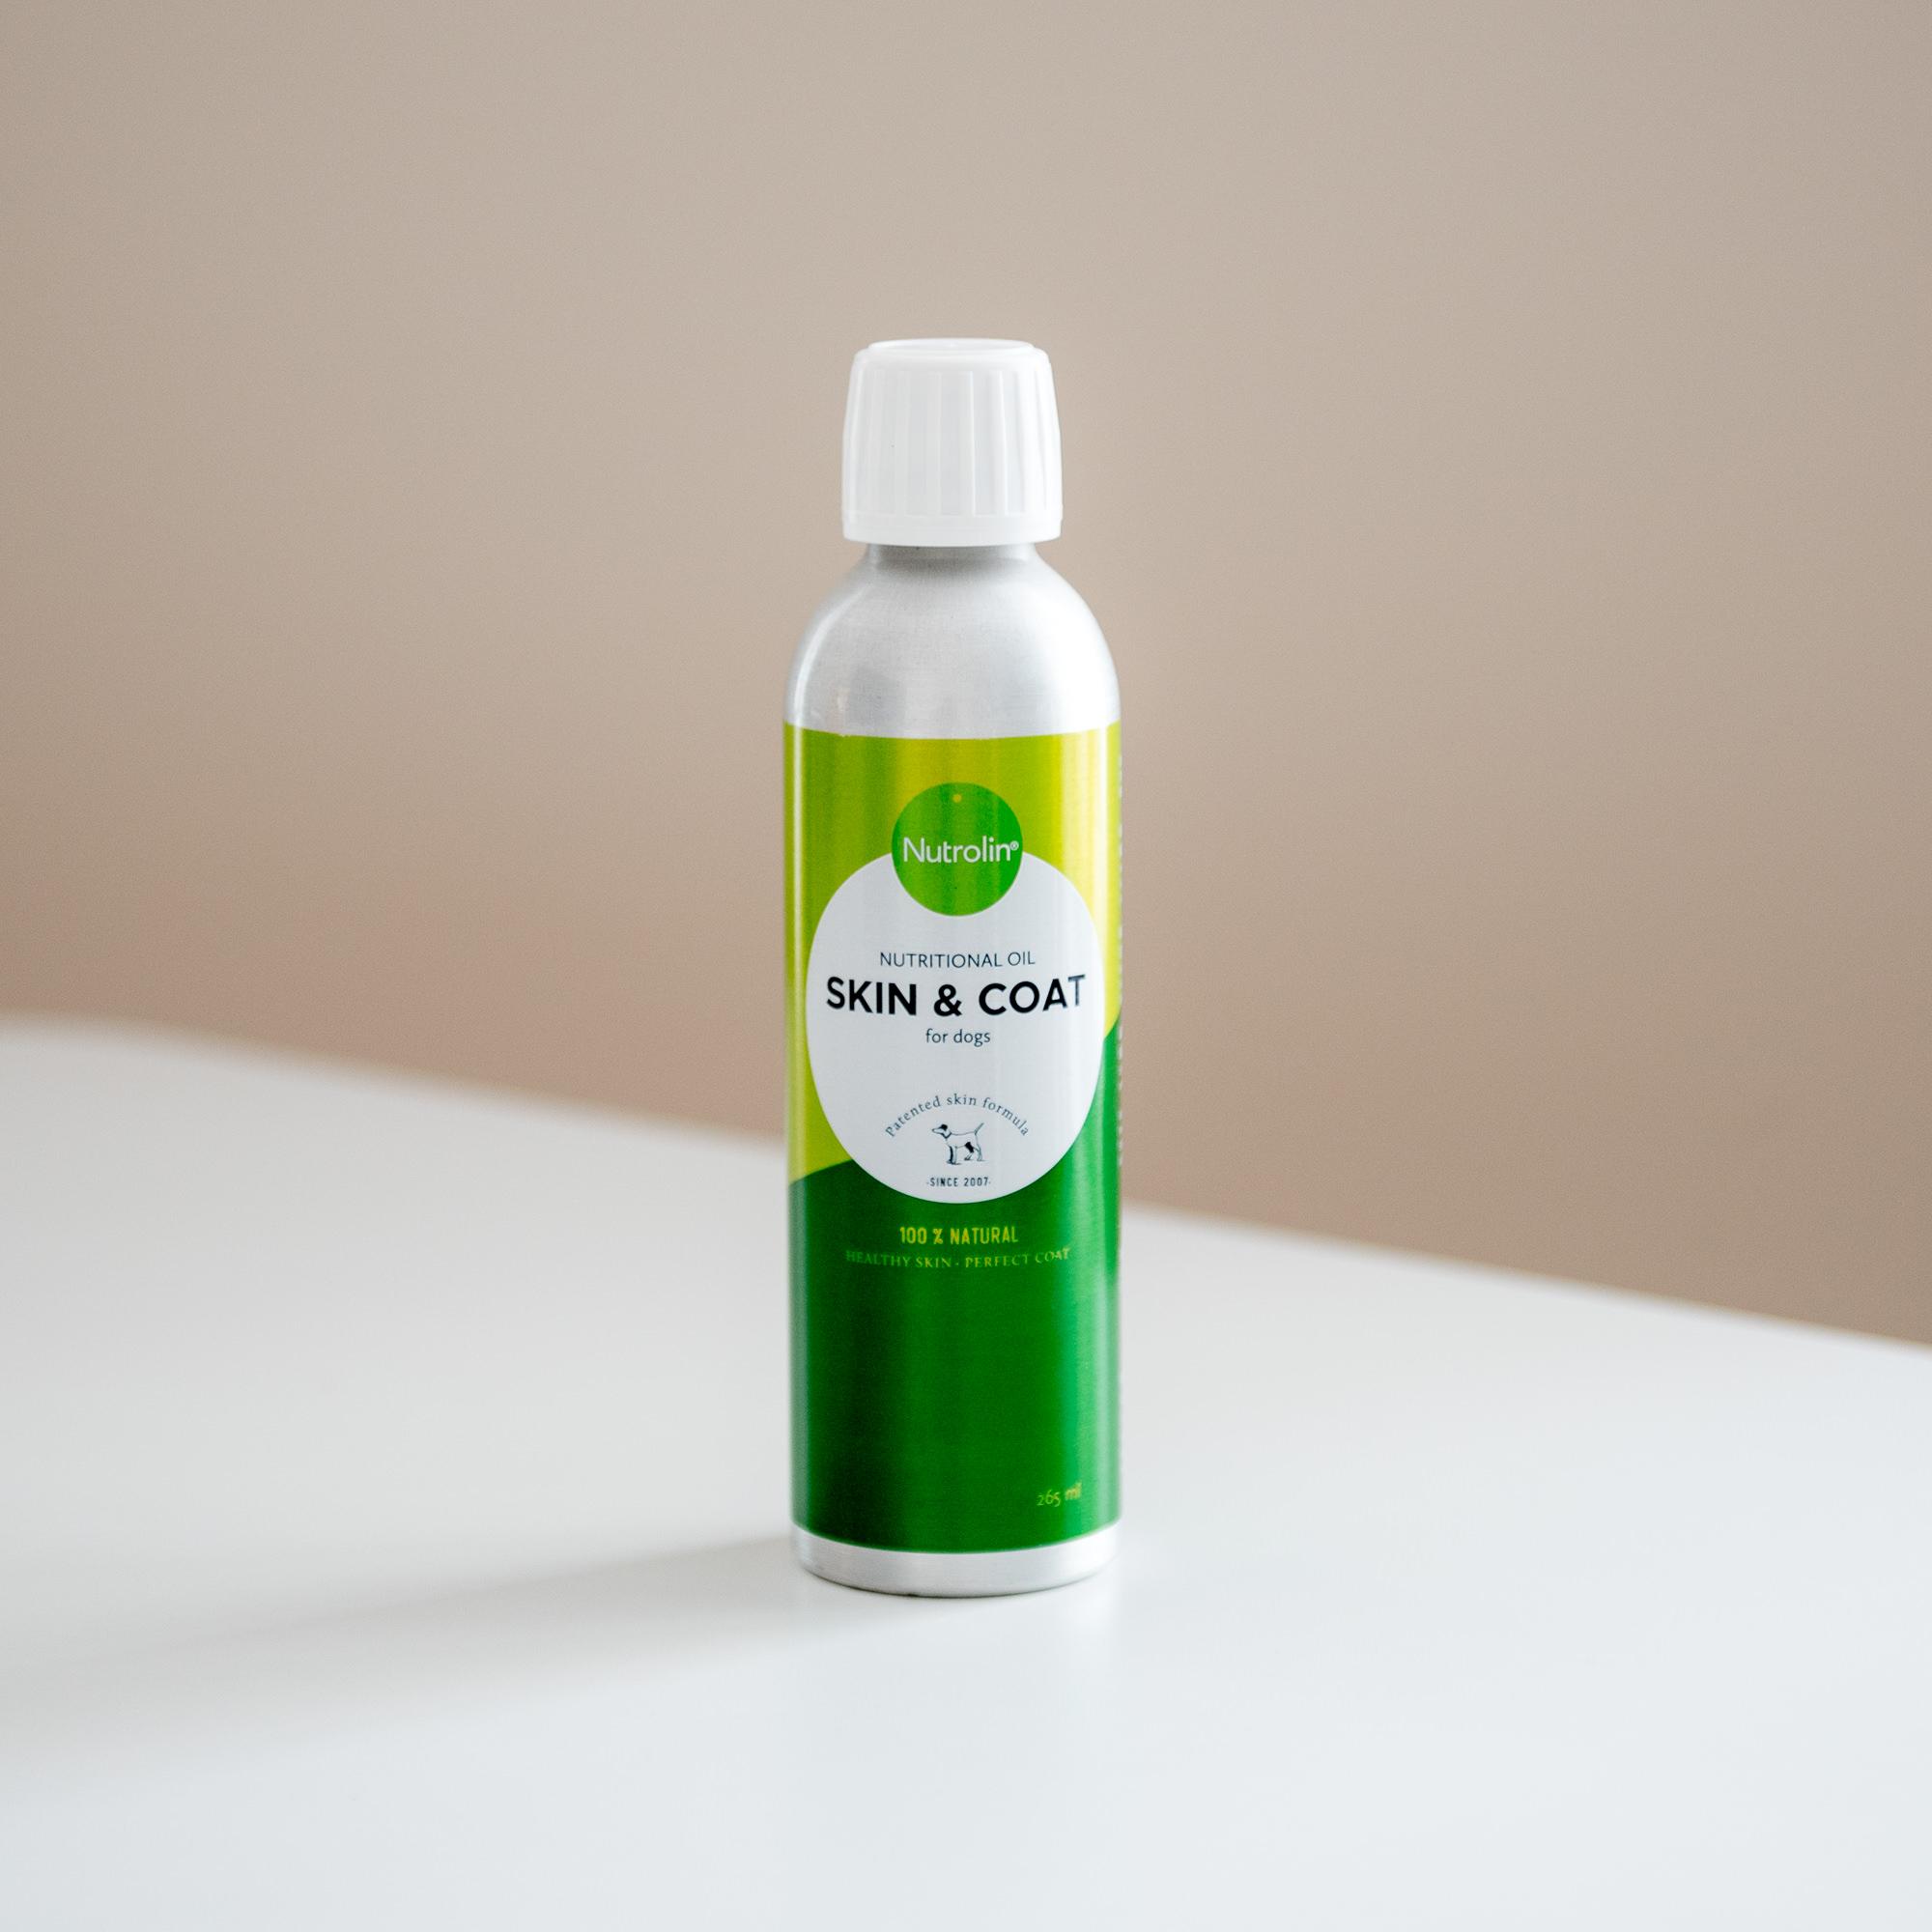 Nutrolin® Skin & Coat - 265 ml